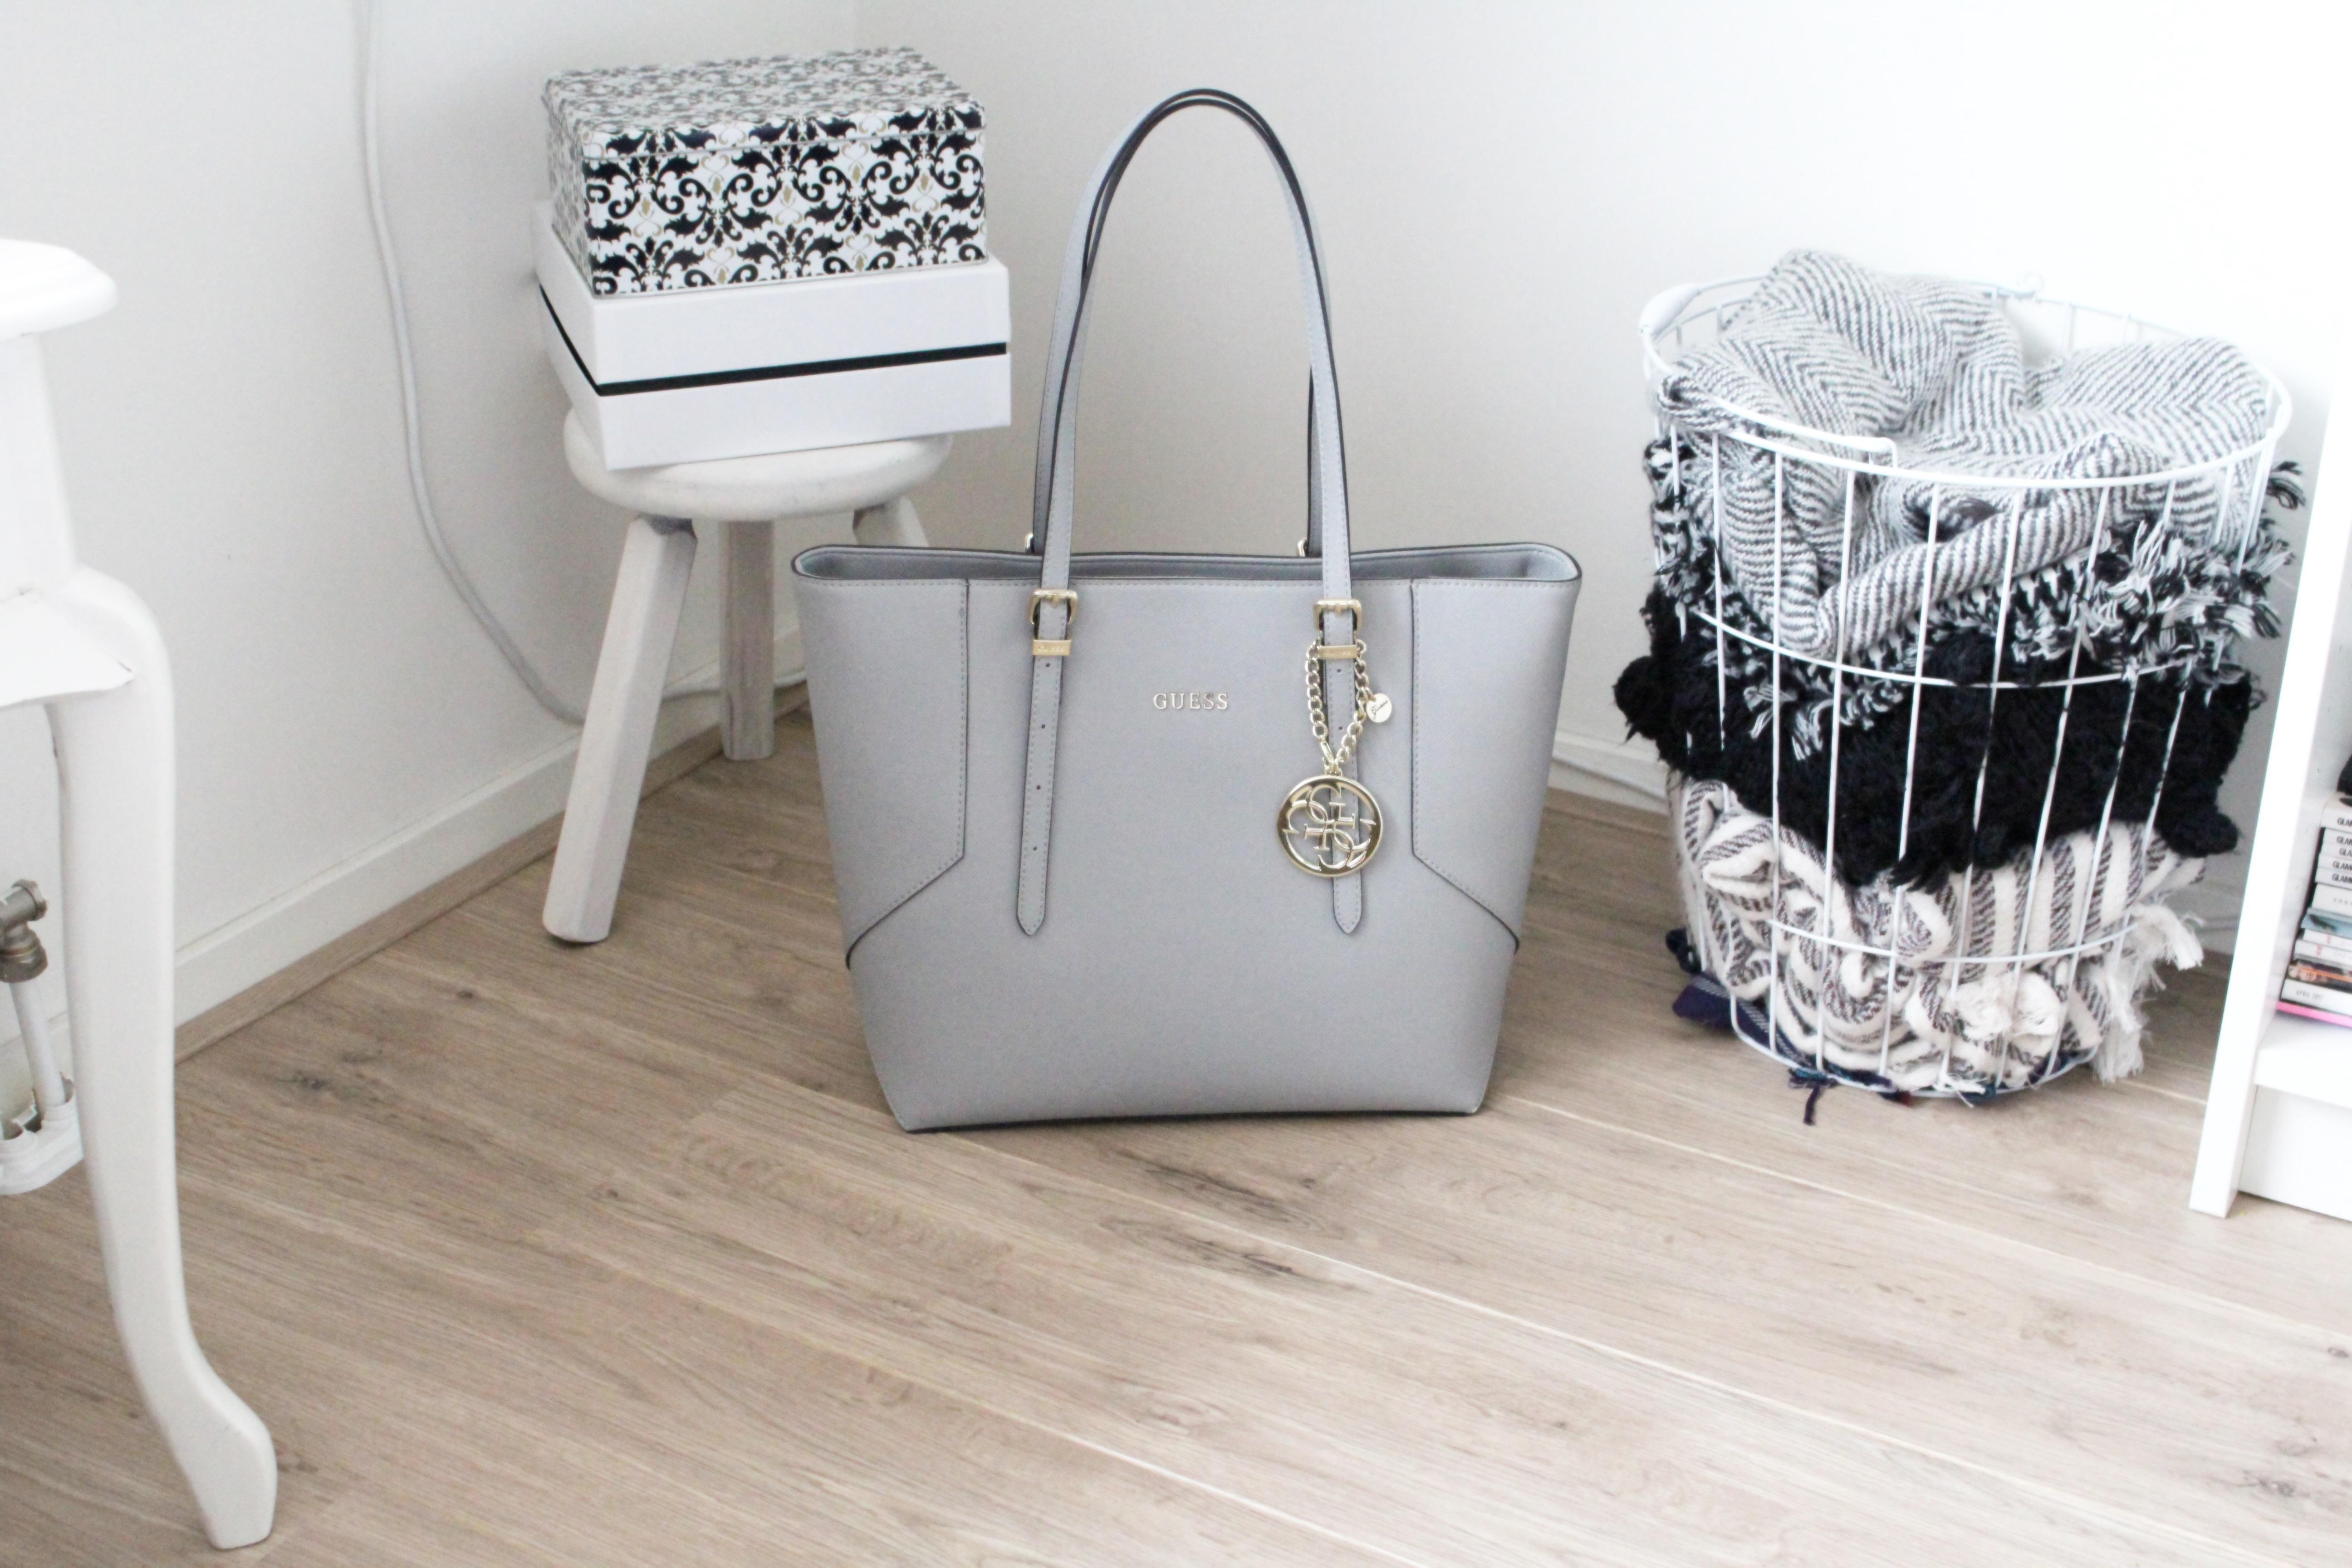 New In | GUESS Isabeau. – Saida Chahid. Fashion, Beauty